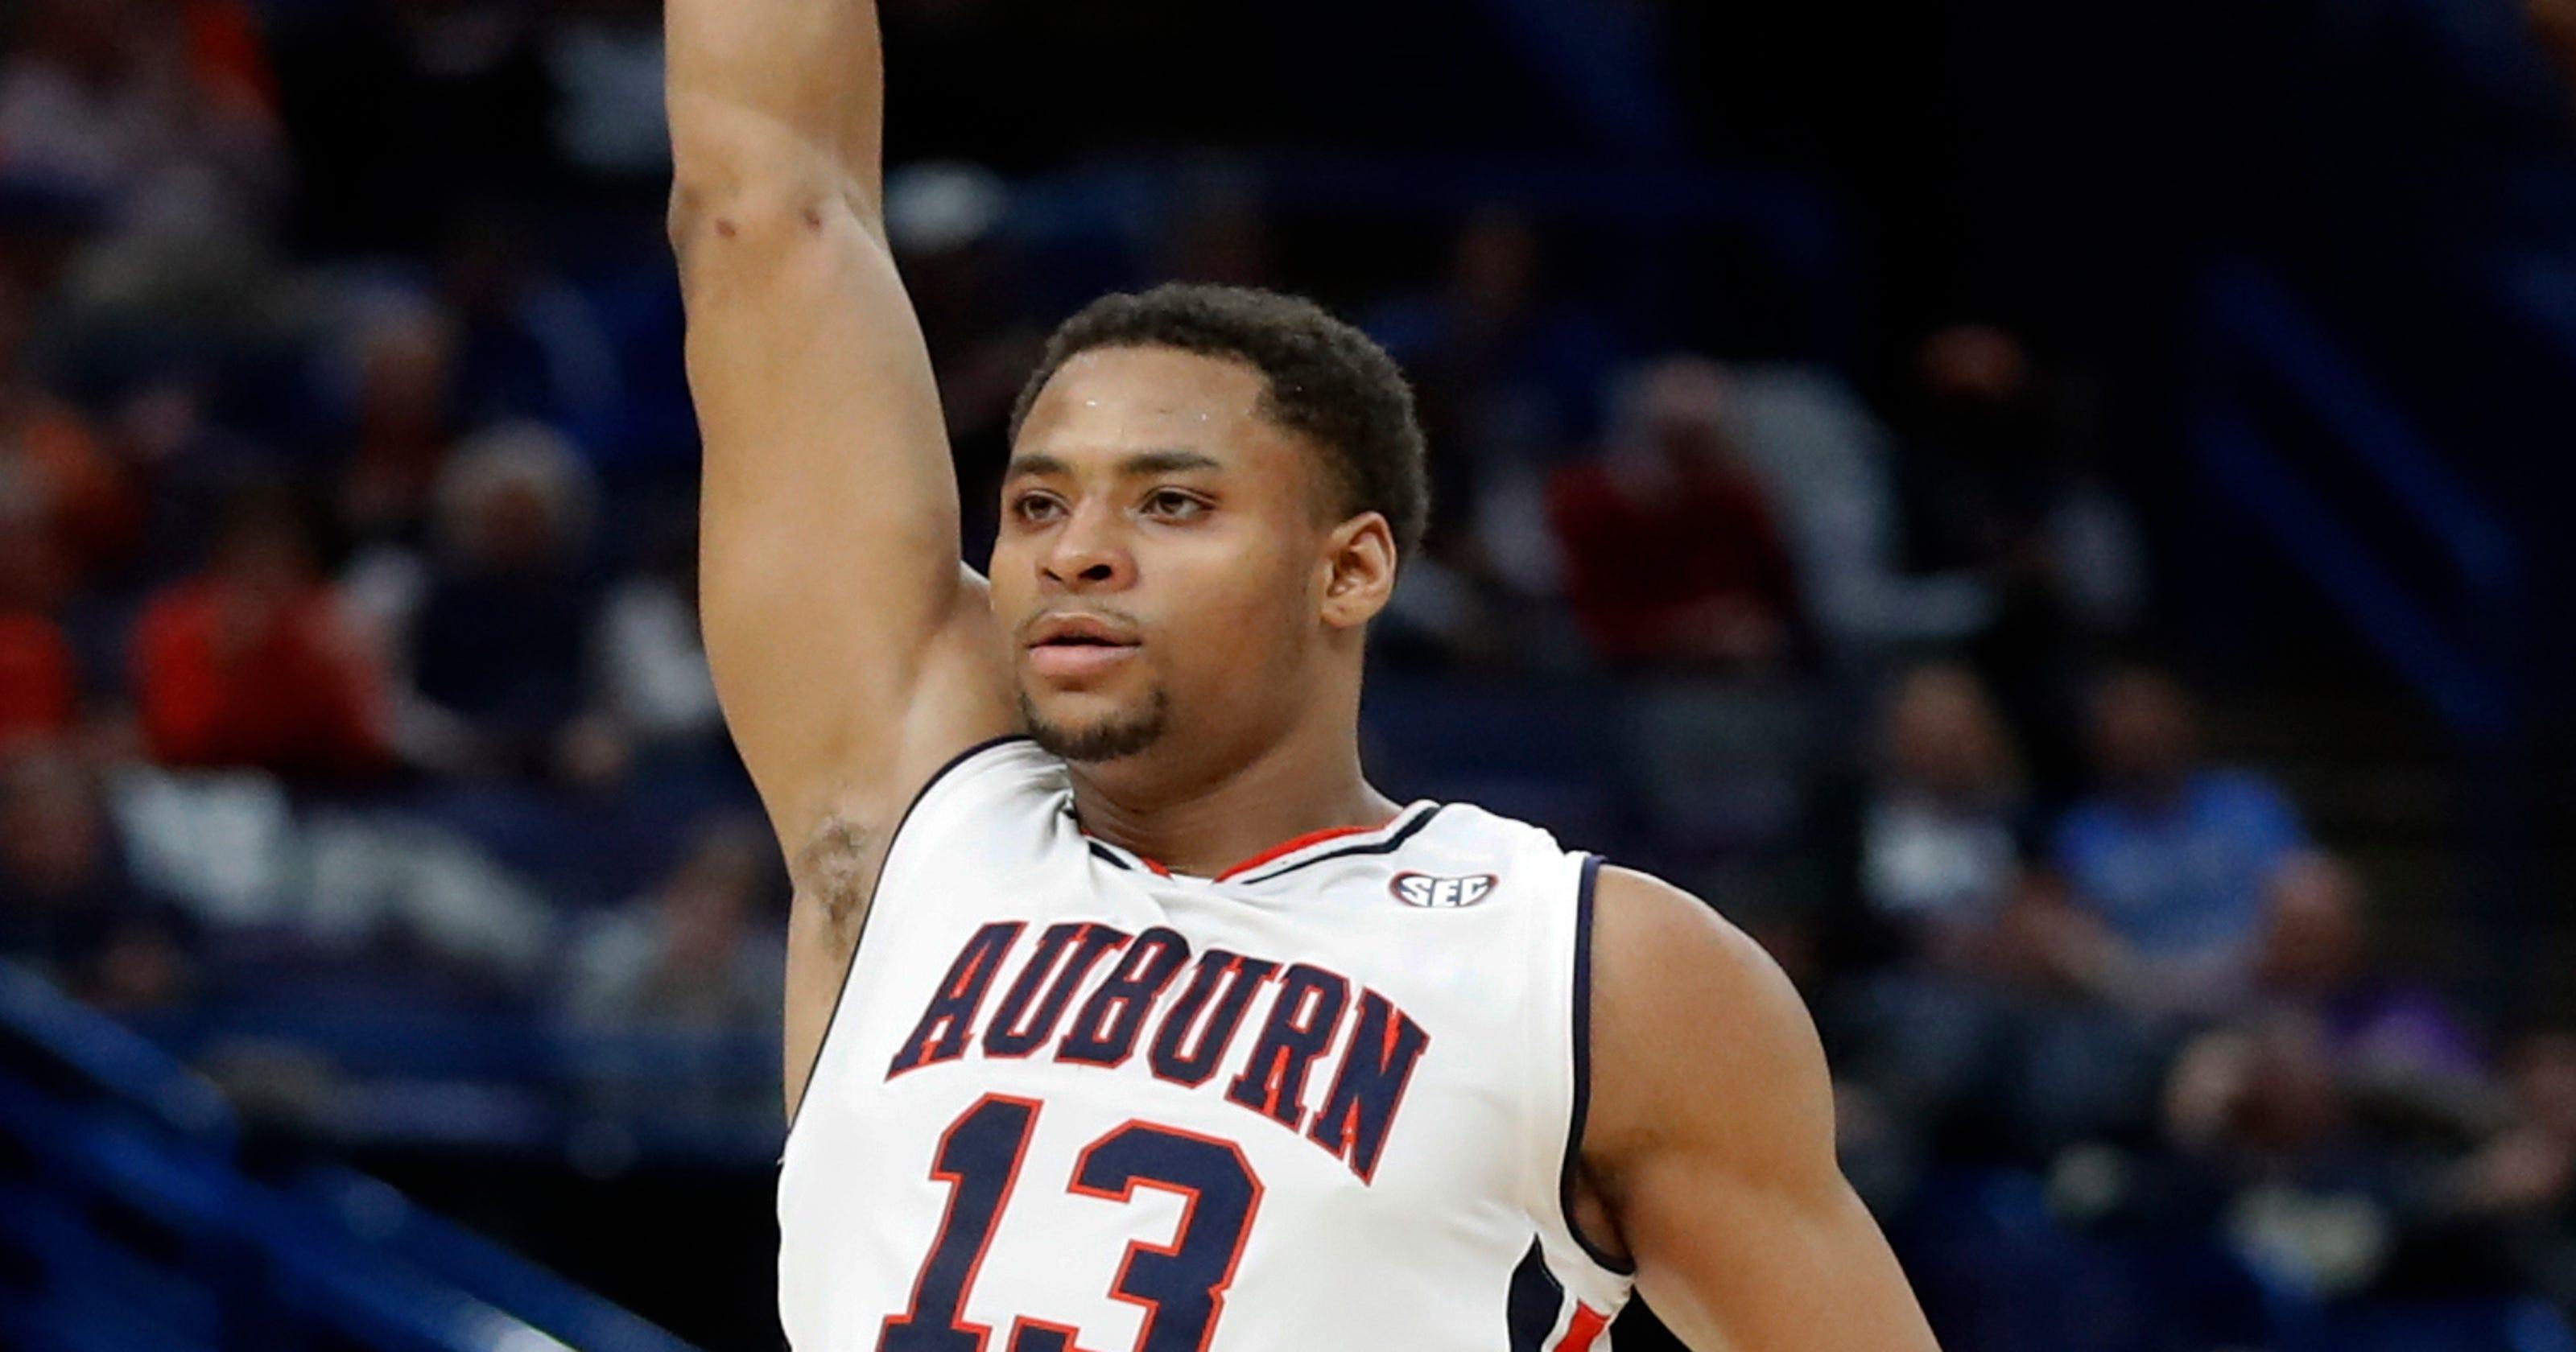 ced4ec38db3 Auburn s Desean Murray to transfer to Western Kentucky